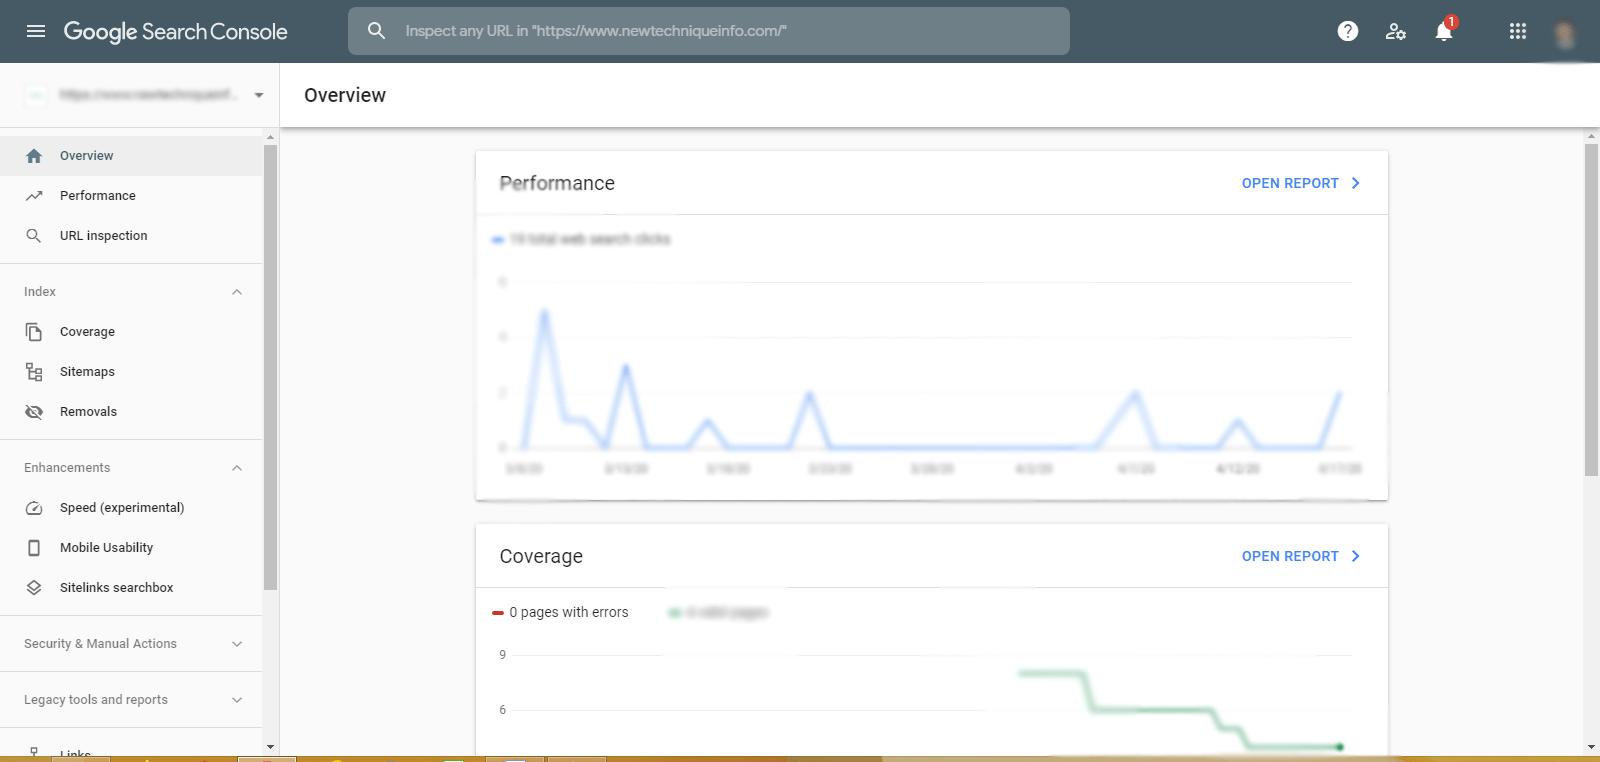 google search console newtechniqueinfo